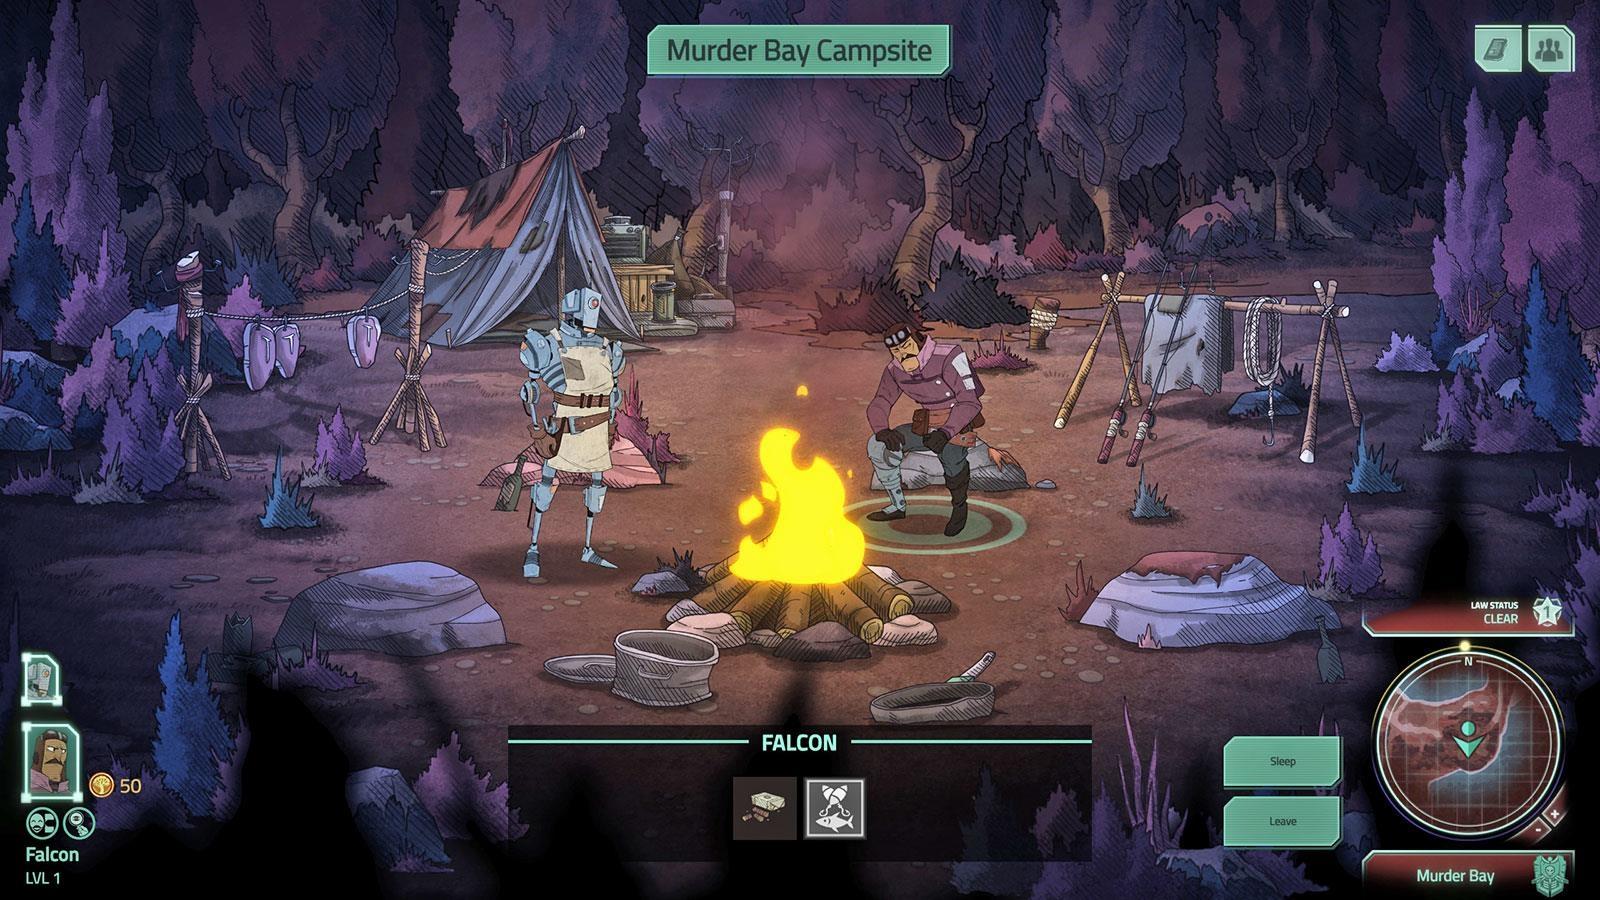 'Don't Starve' studio's sci-fi RPG looks like a gritty cartoon | DeviceDaily.com